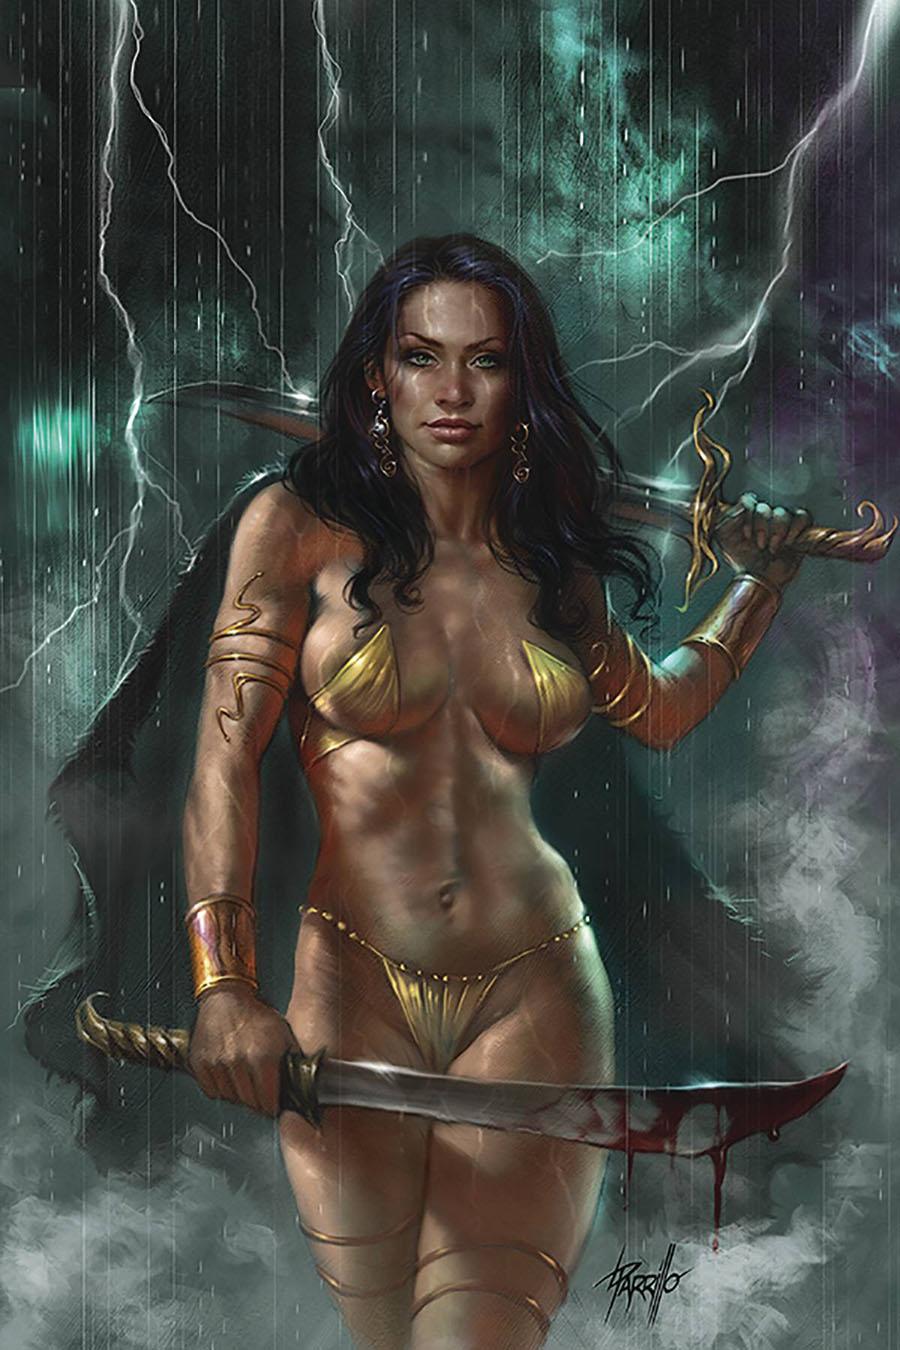 Dejah Thoris Vol 3 #5 Cover R Limited Edition Lucio Parrillo Virgin Cover